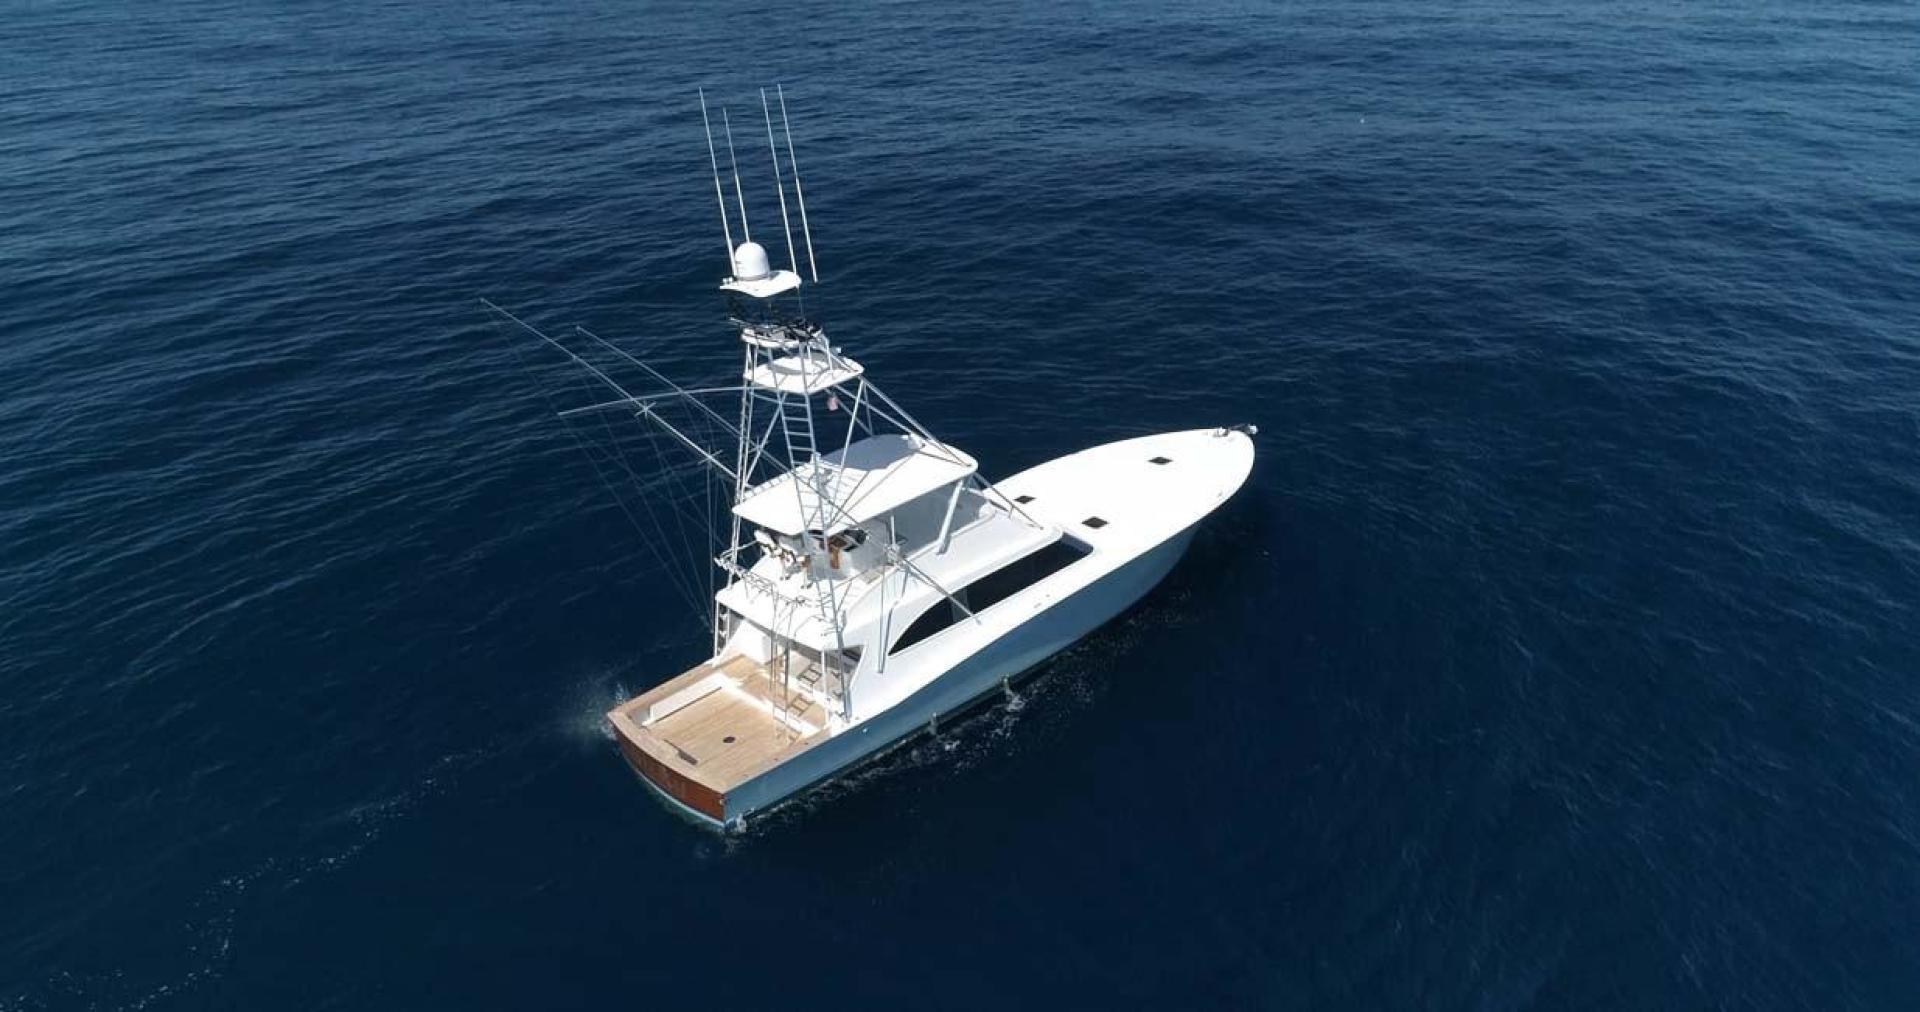 Jim-Smith-Custom-Convertible-Sportfish-2006-Silky-Palm-Beach-Florida-United-States-Aerial-View-924601